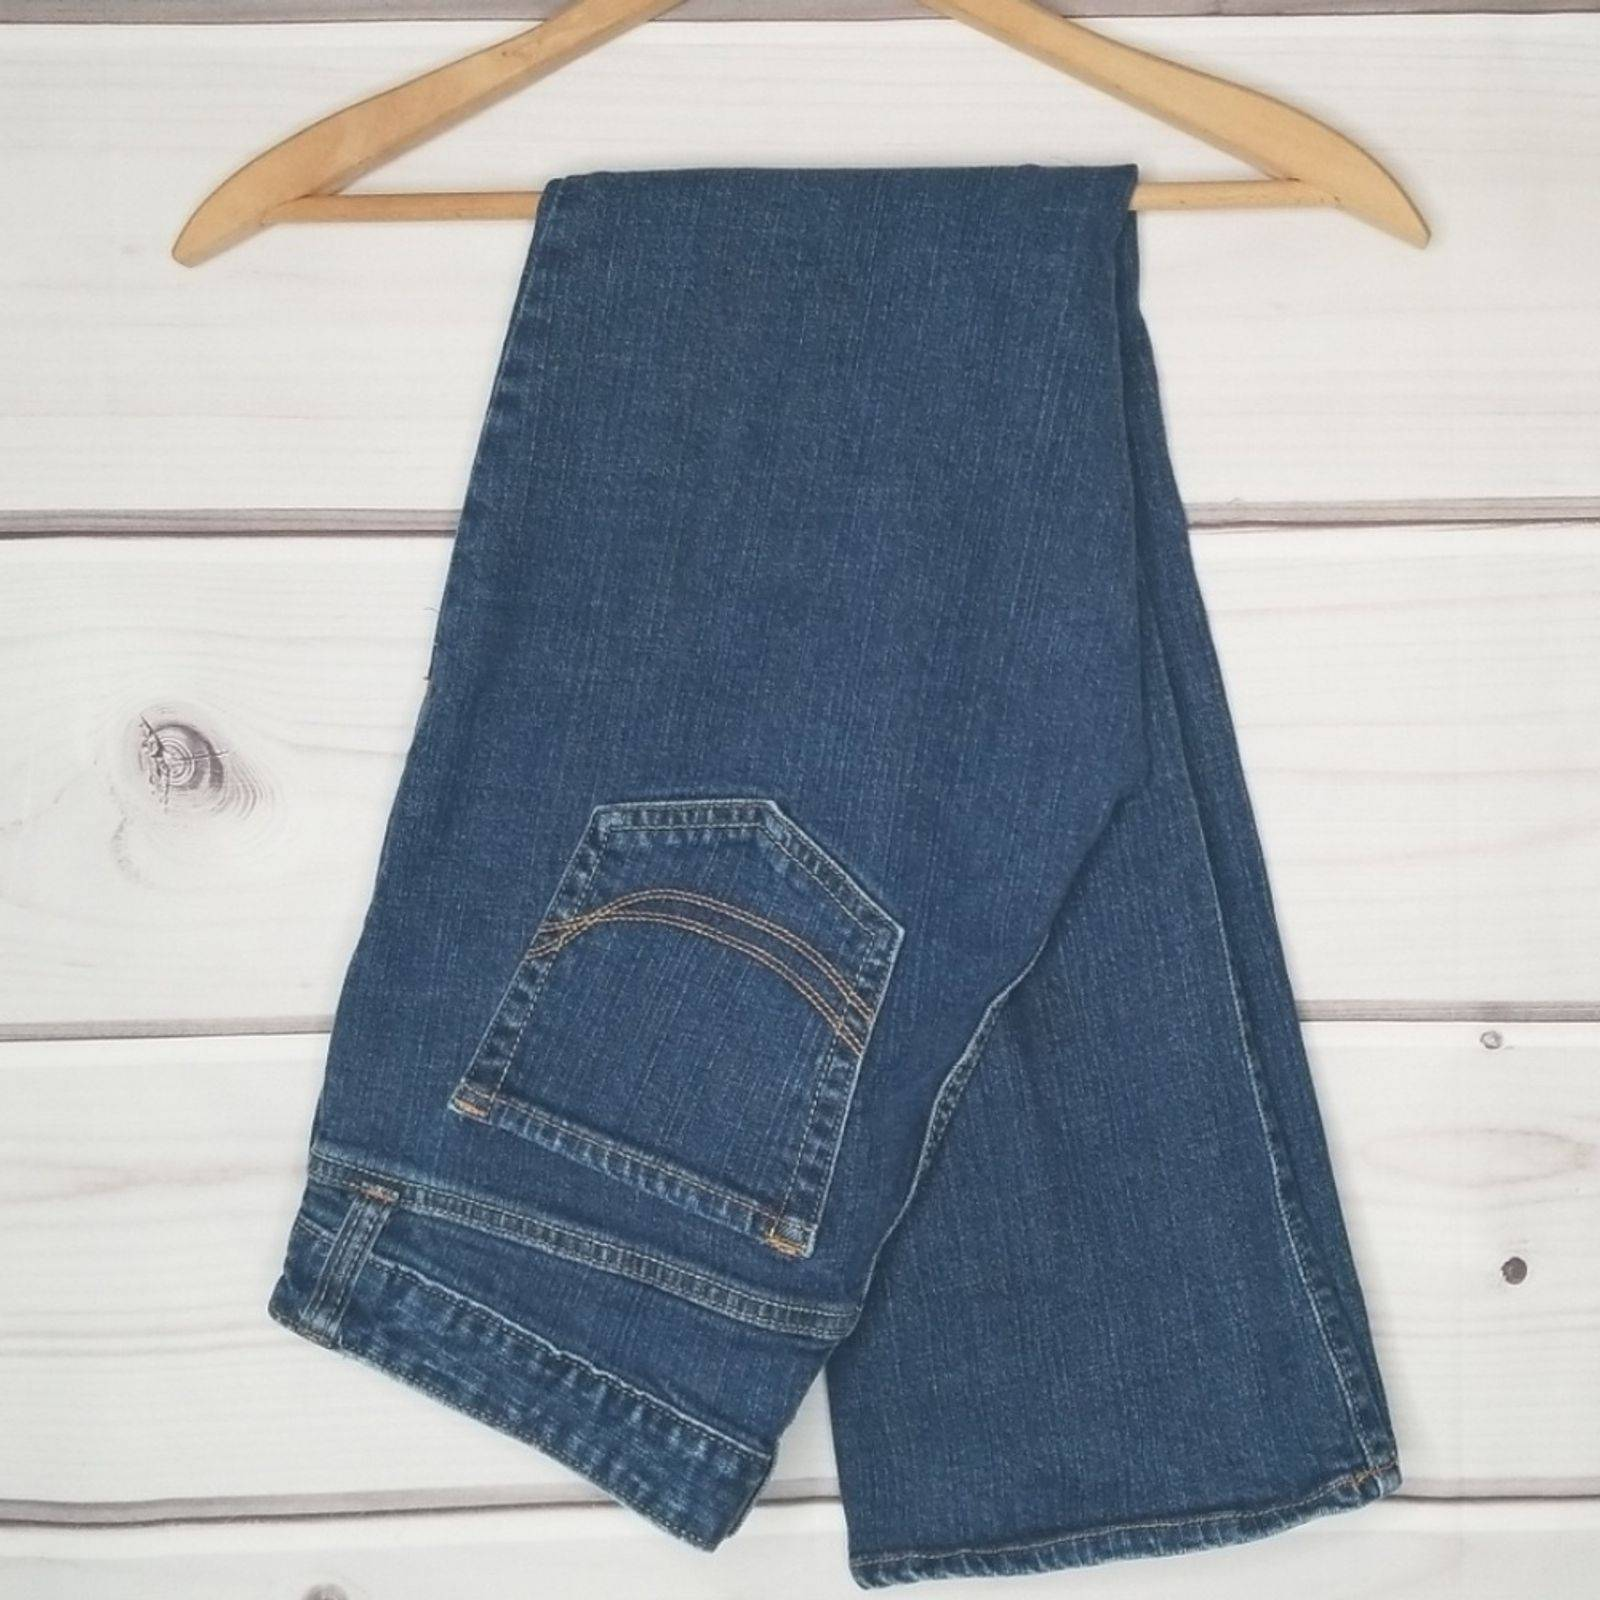 Old Navy Dreamer Jeans Size 8 Short